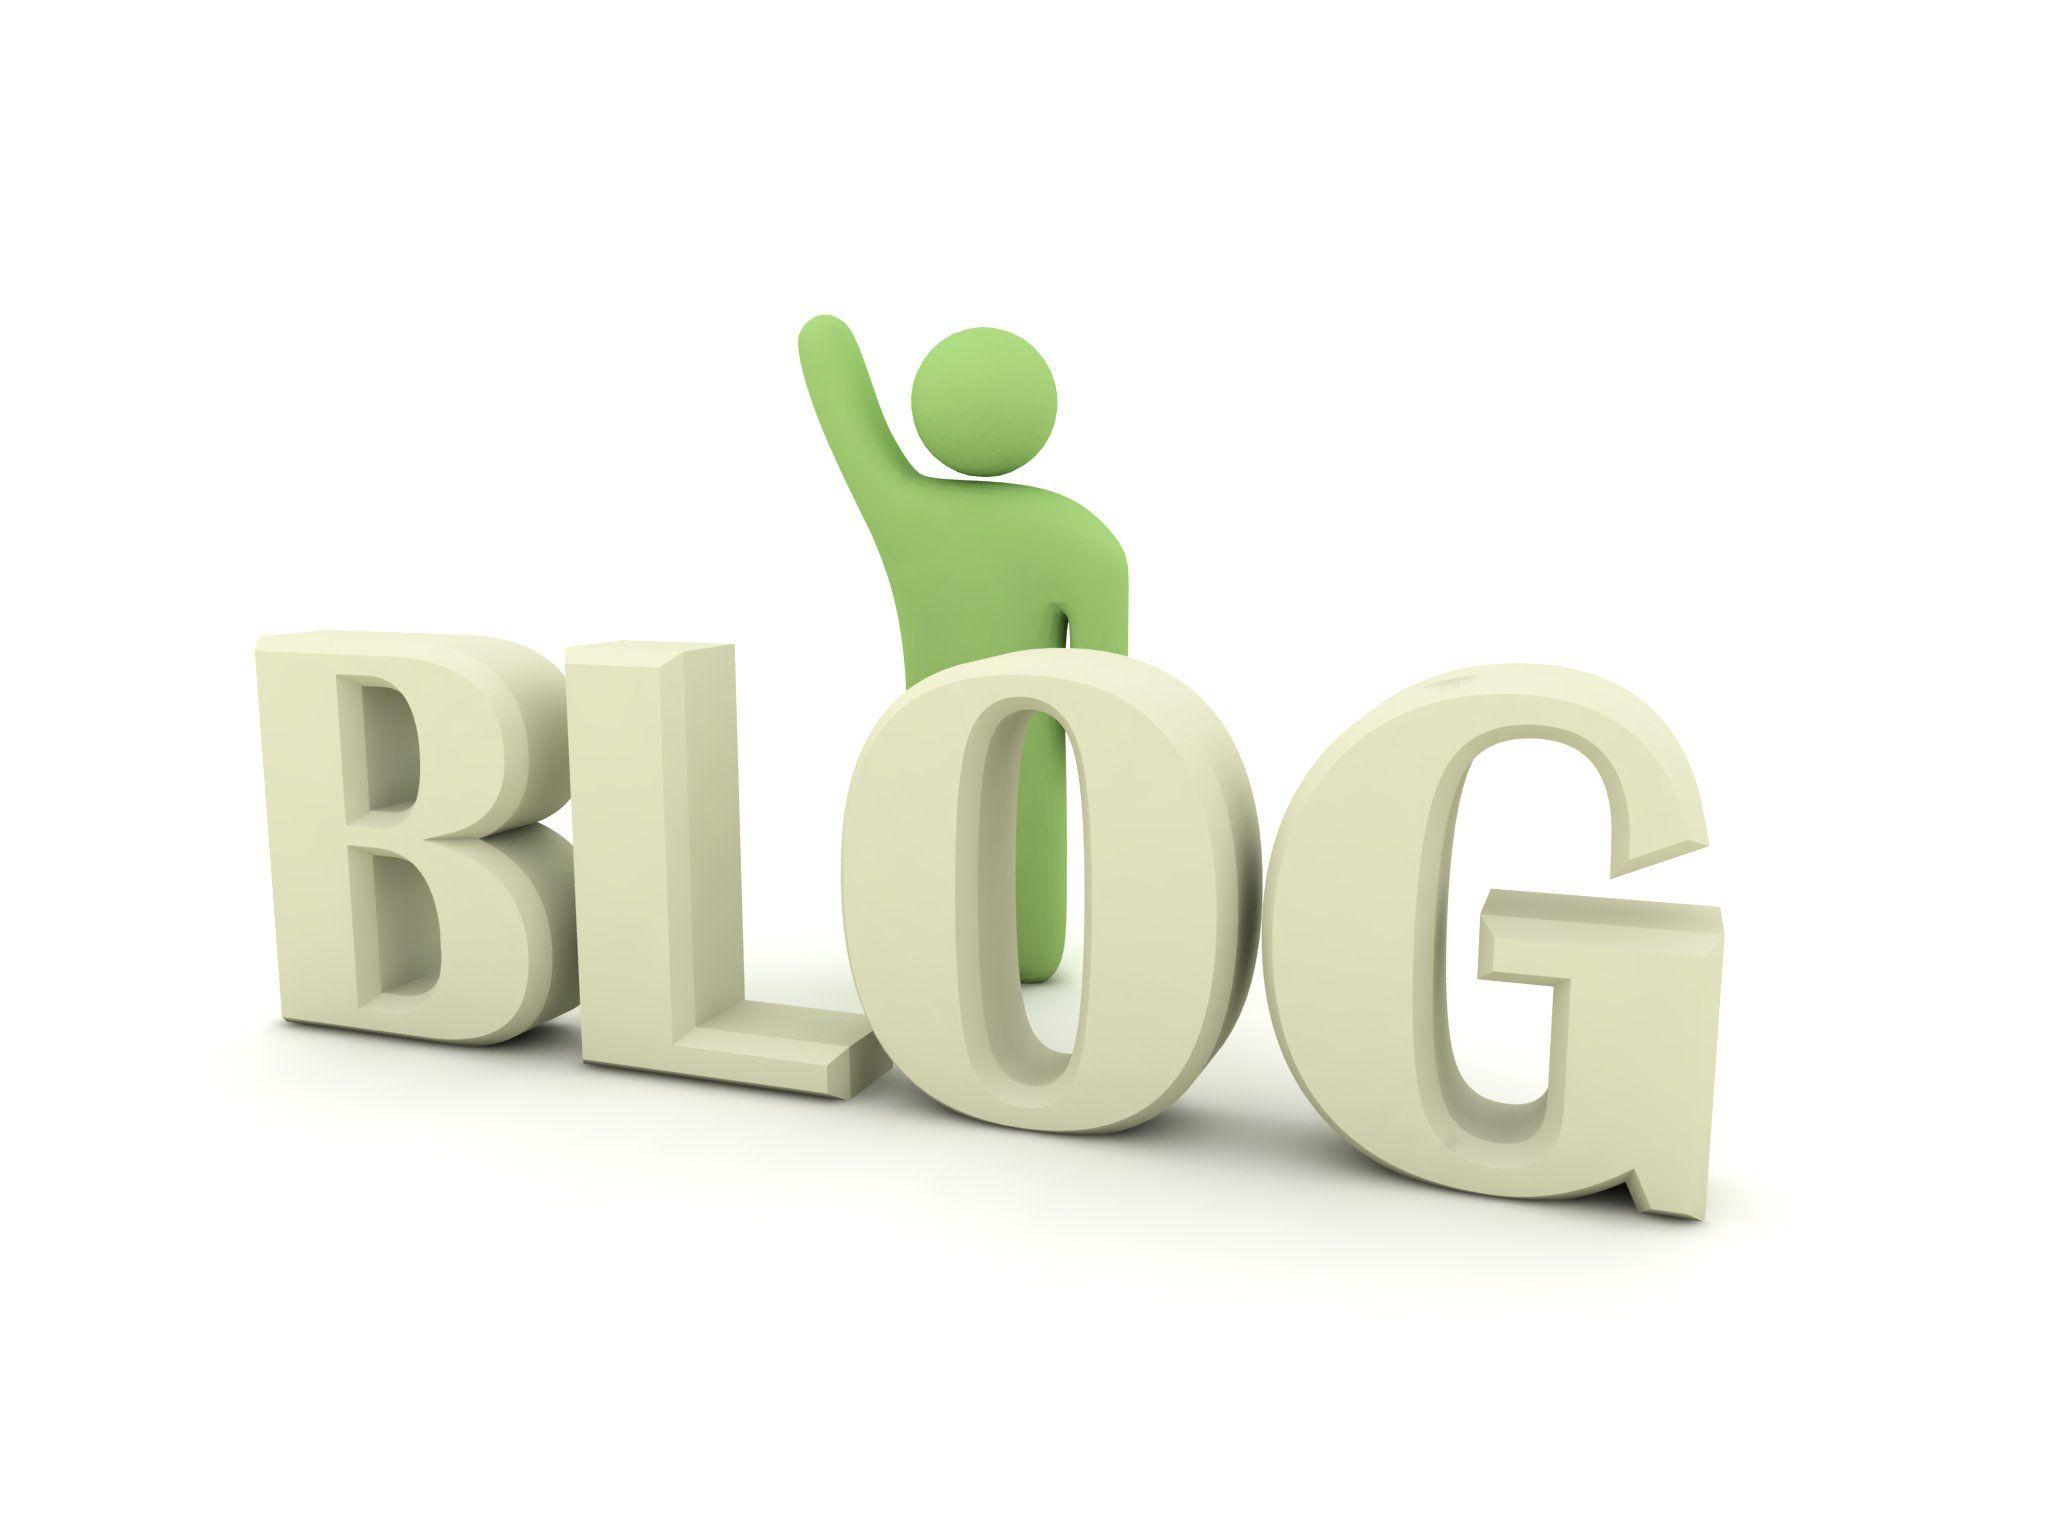 planeje seu blog